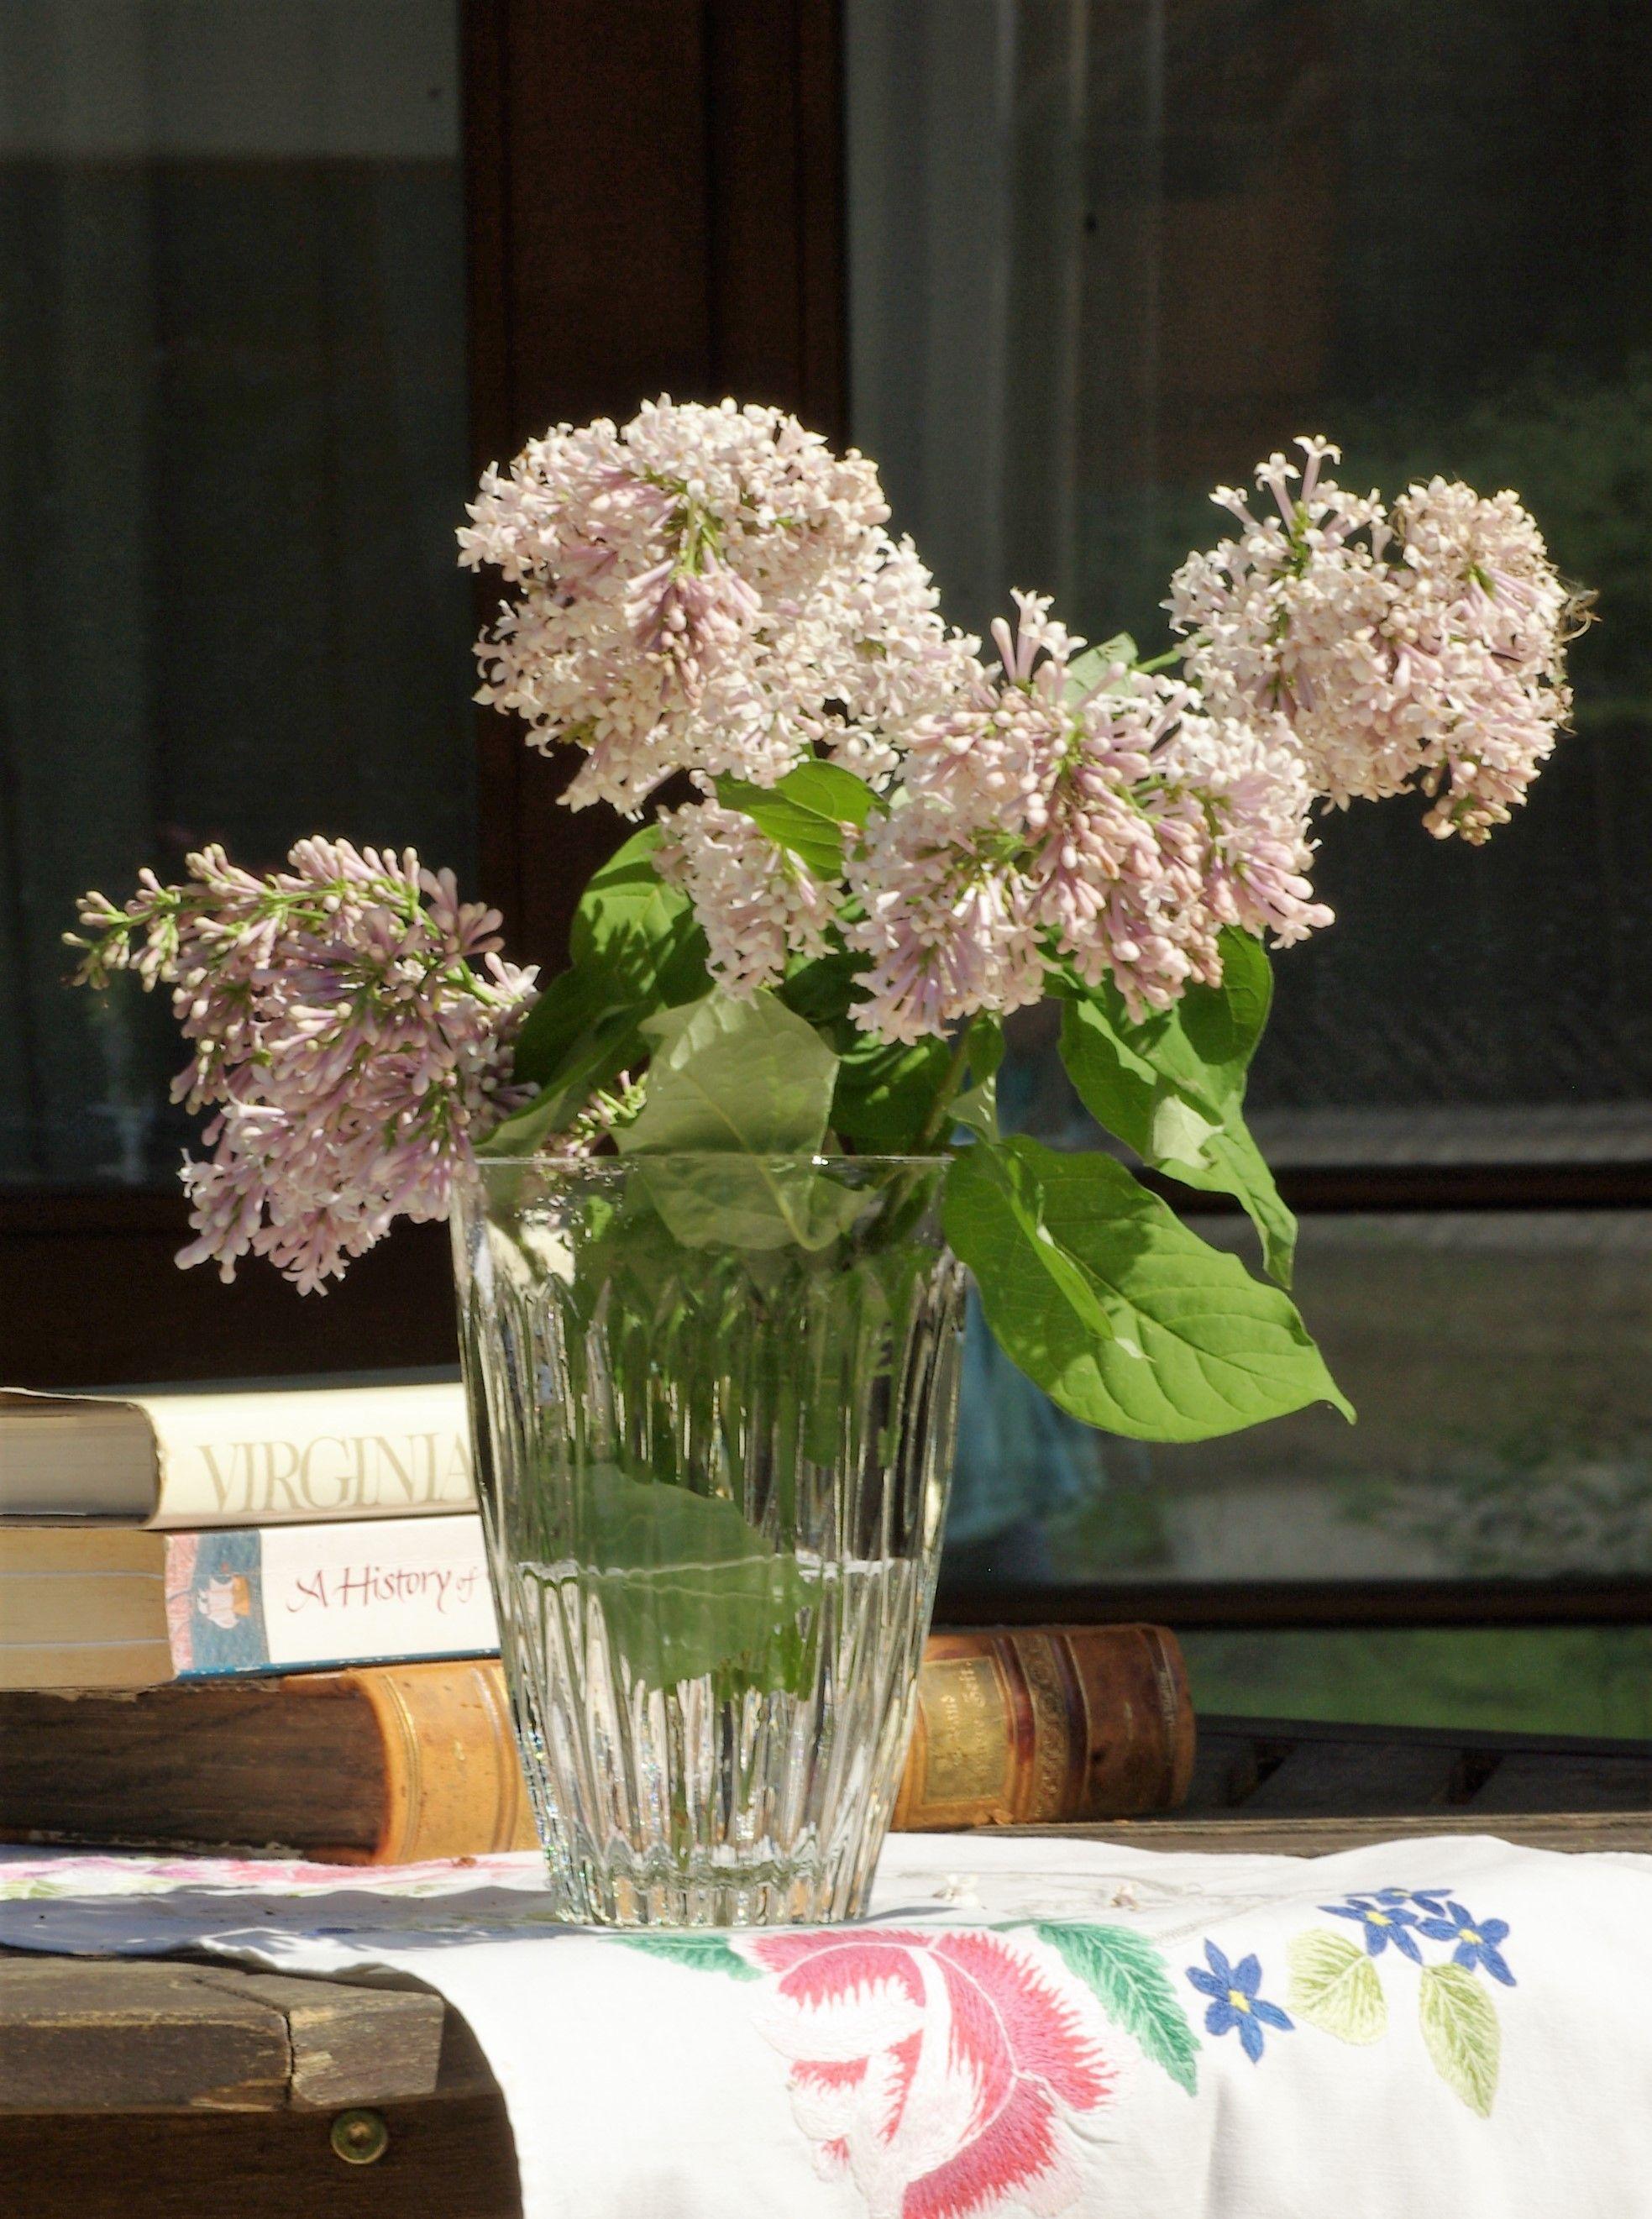 Vintage glass vase for flowers vintage bud vase from pressed cut glass vases centerpiece home decor retro interiors table centerpiece retro flower